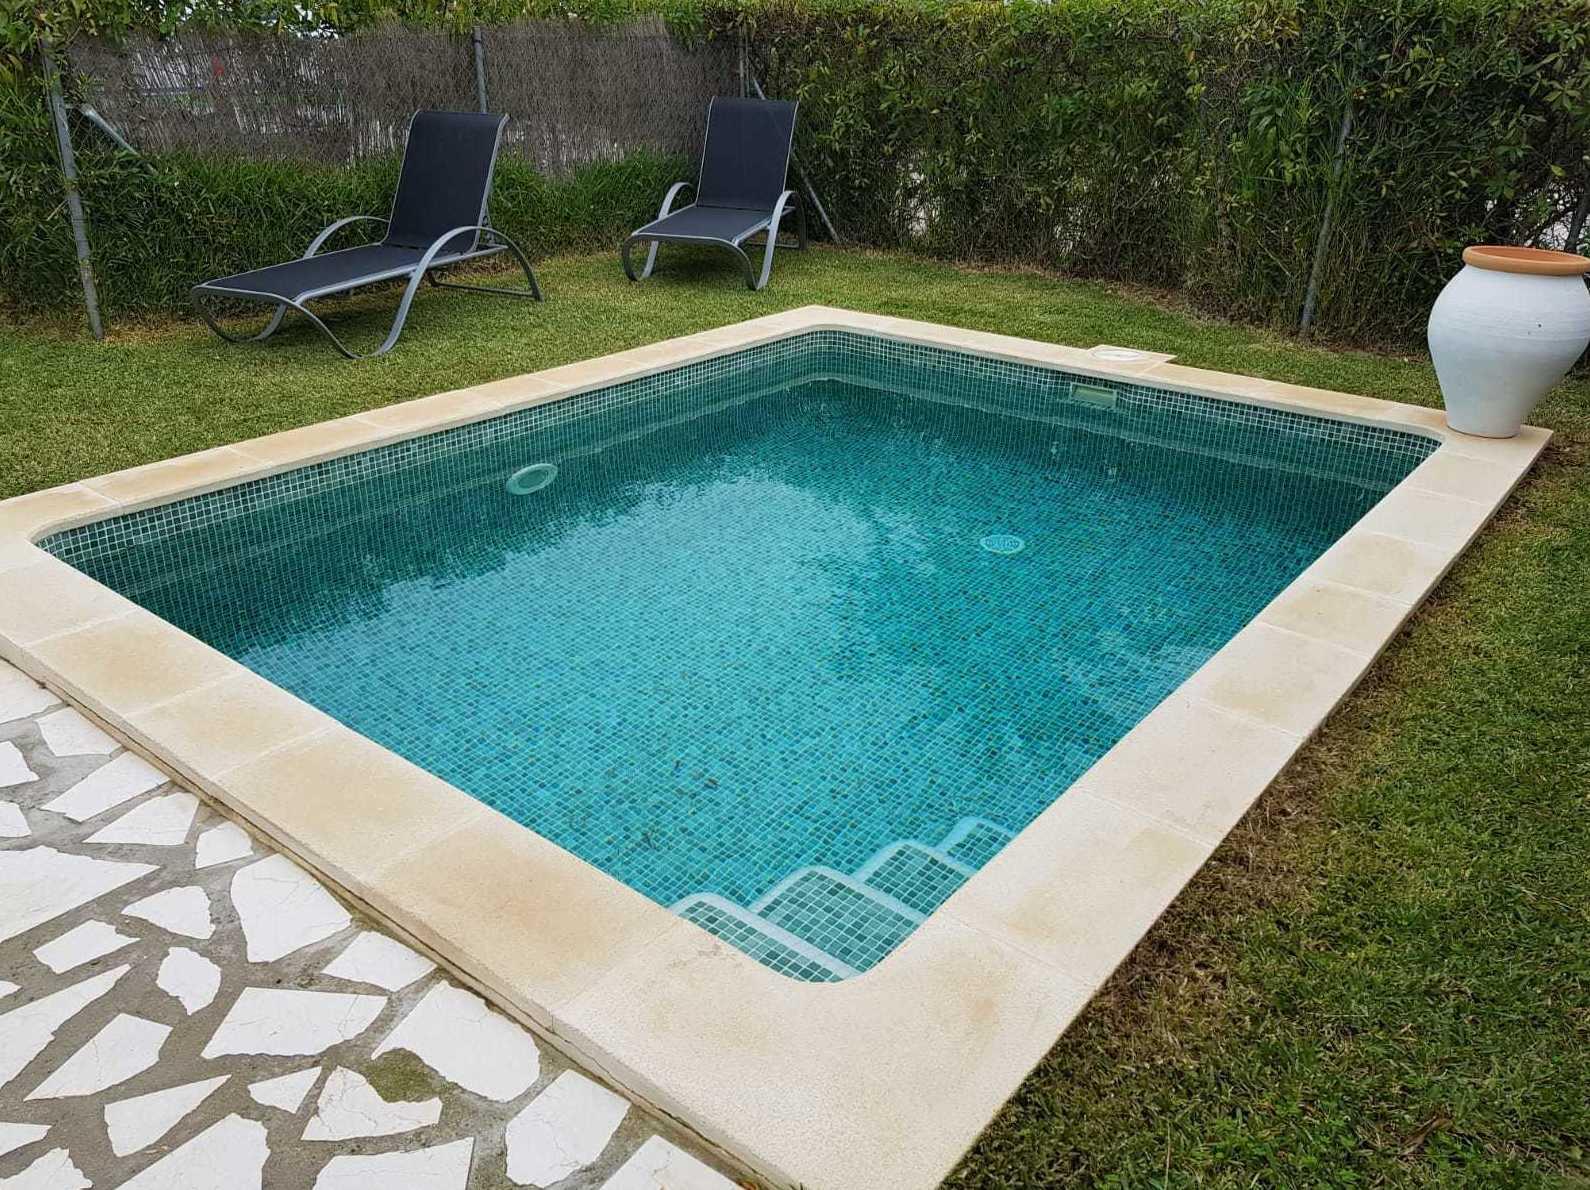 Foto 25 de Instalación de piscinas en  | Aiguanet Garden & Pool